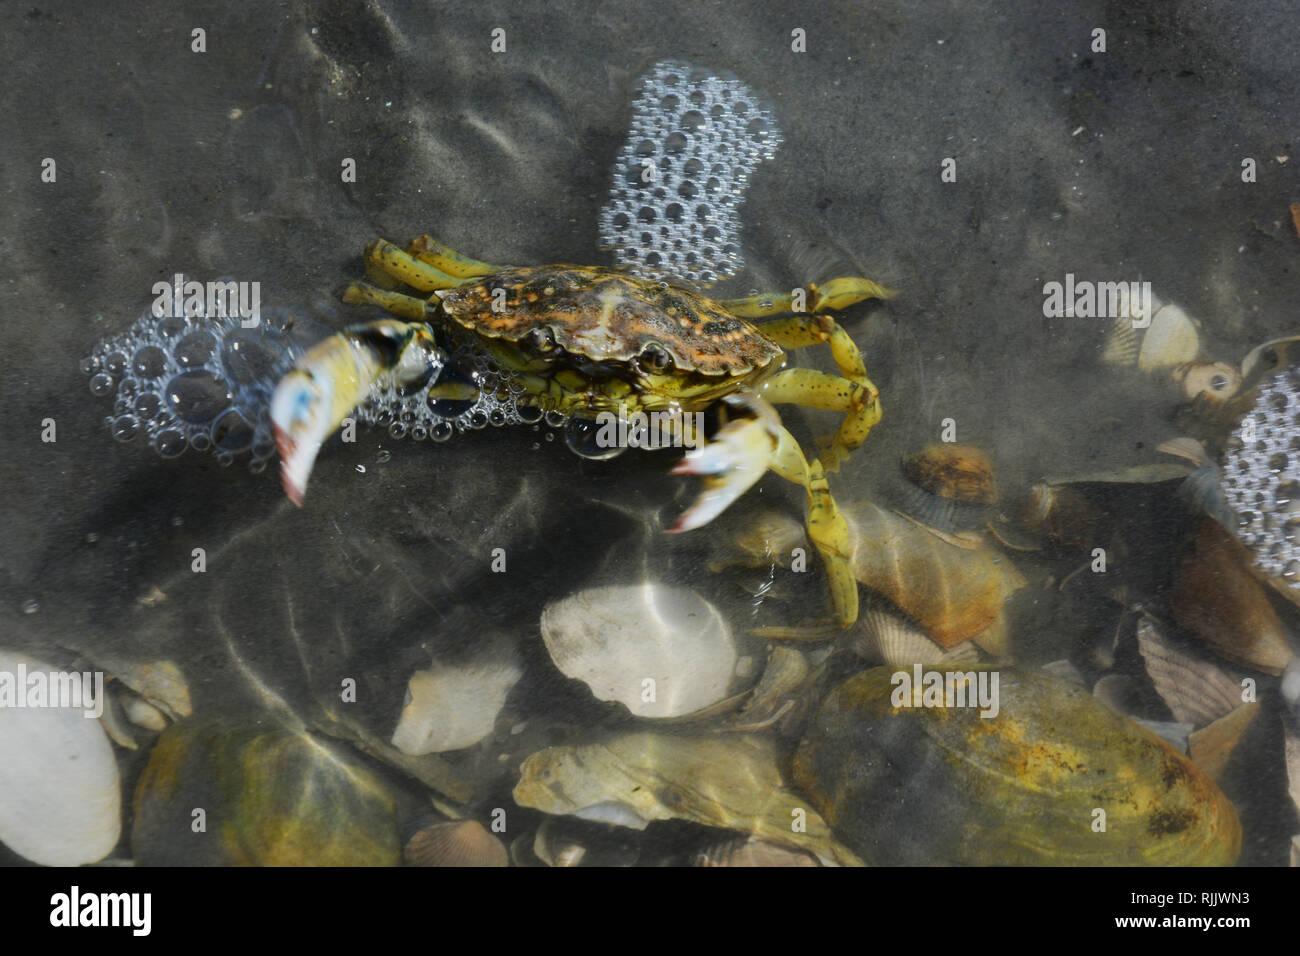 Krebs, Krabbe, Wattenmeer, Watt, Hintergrund - Stock Image